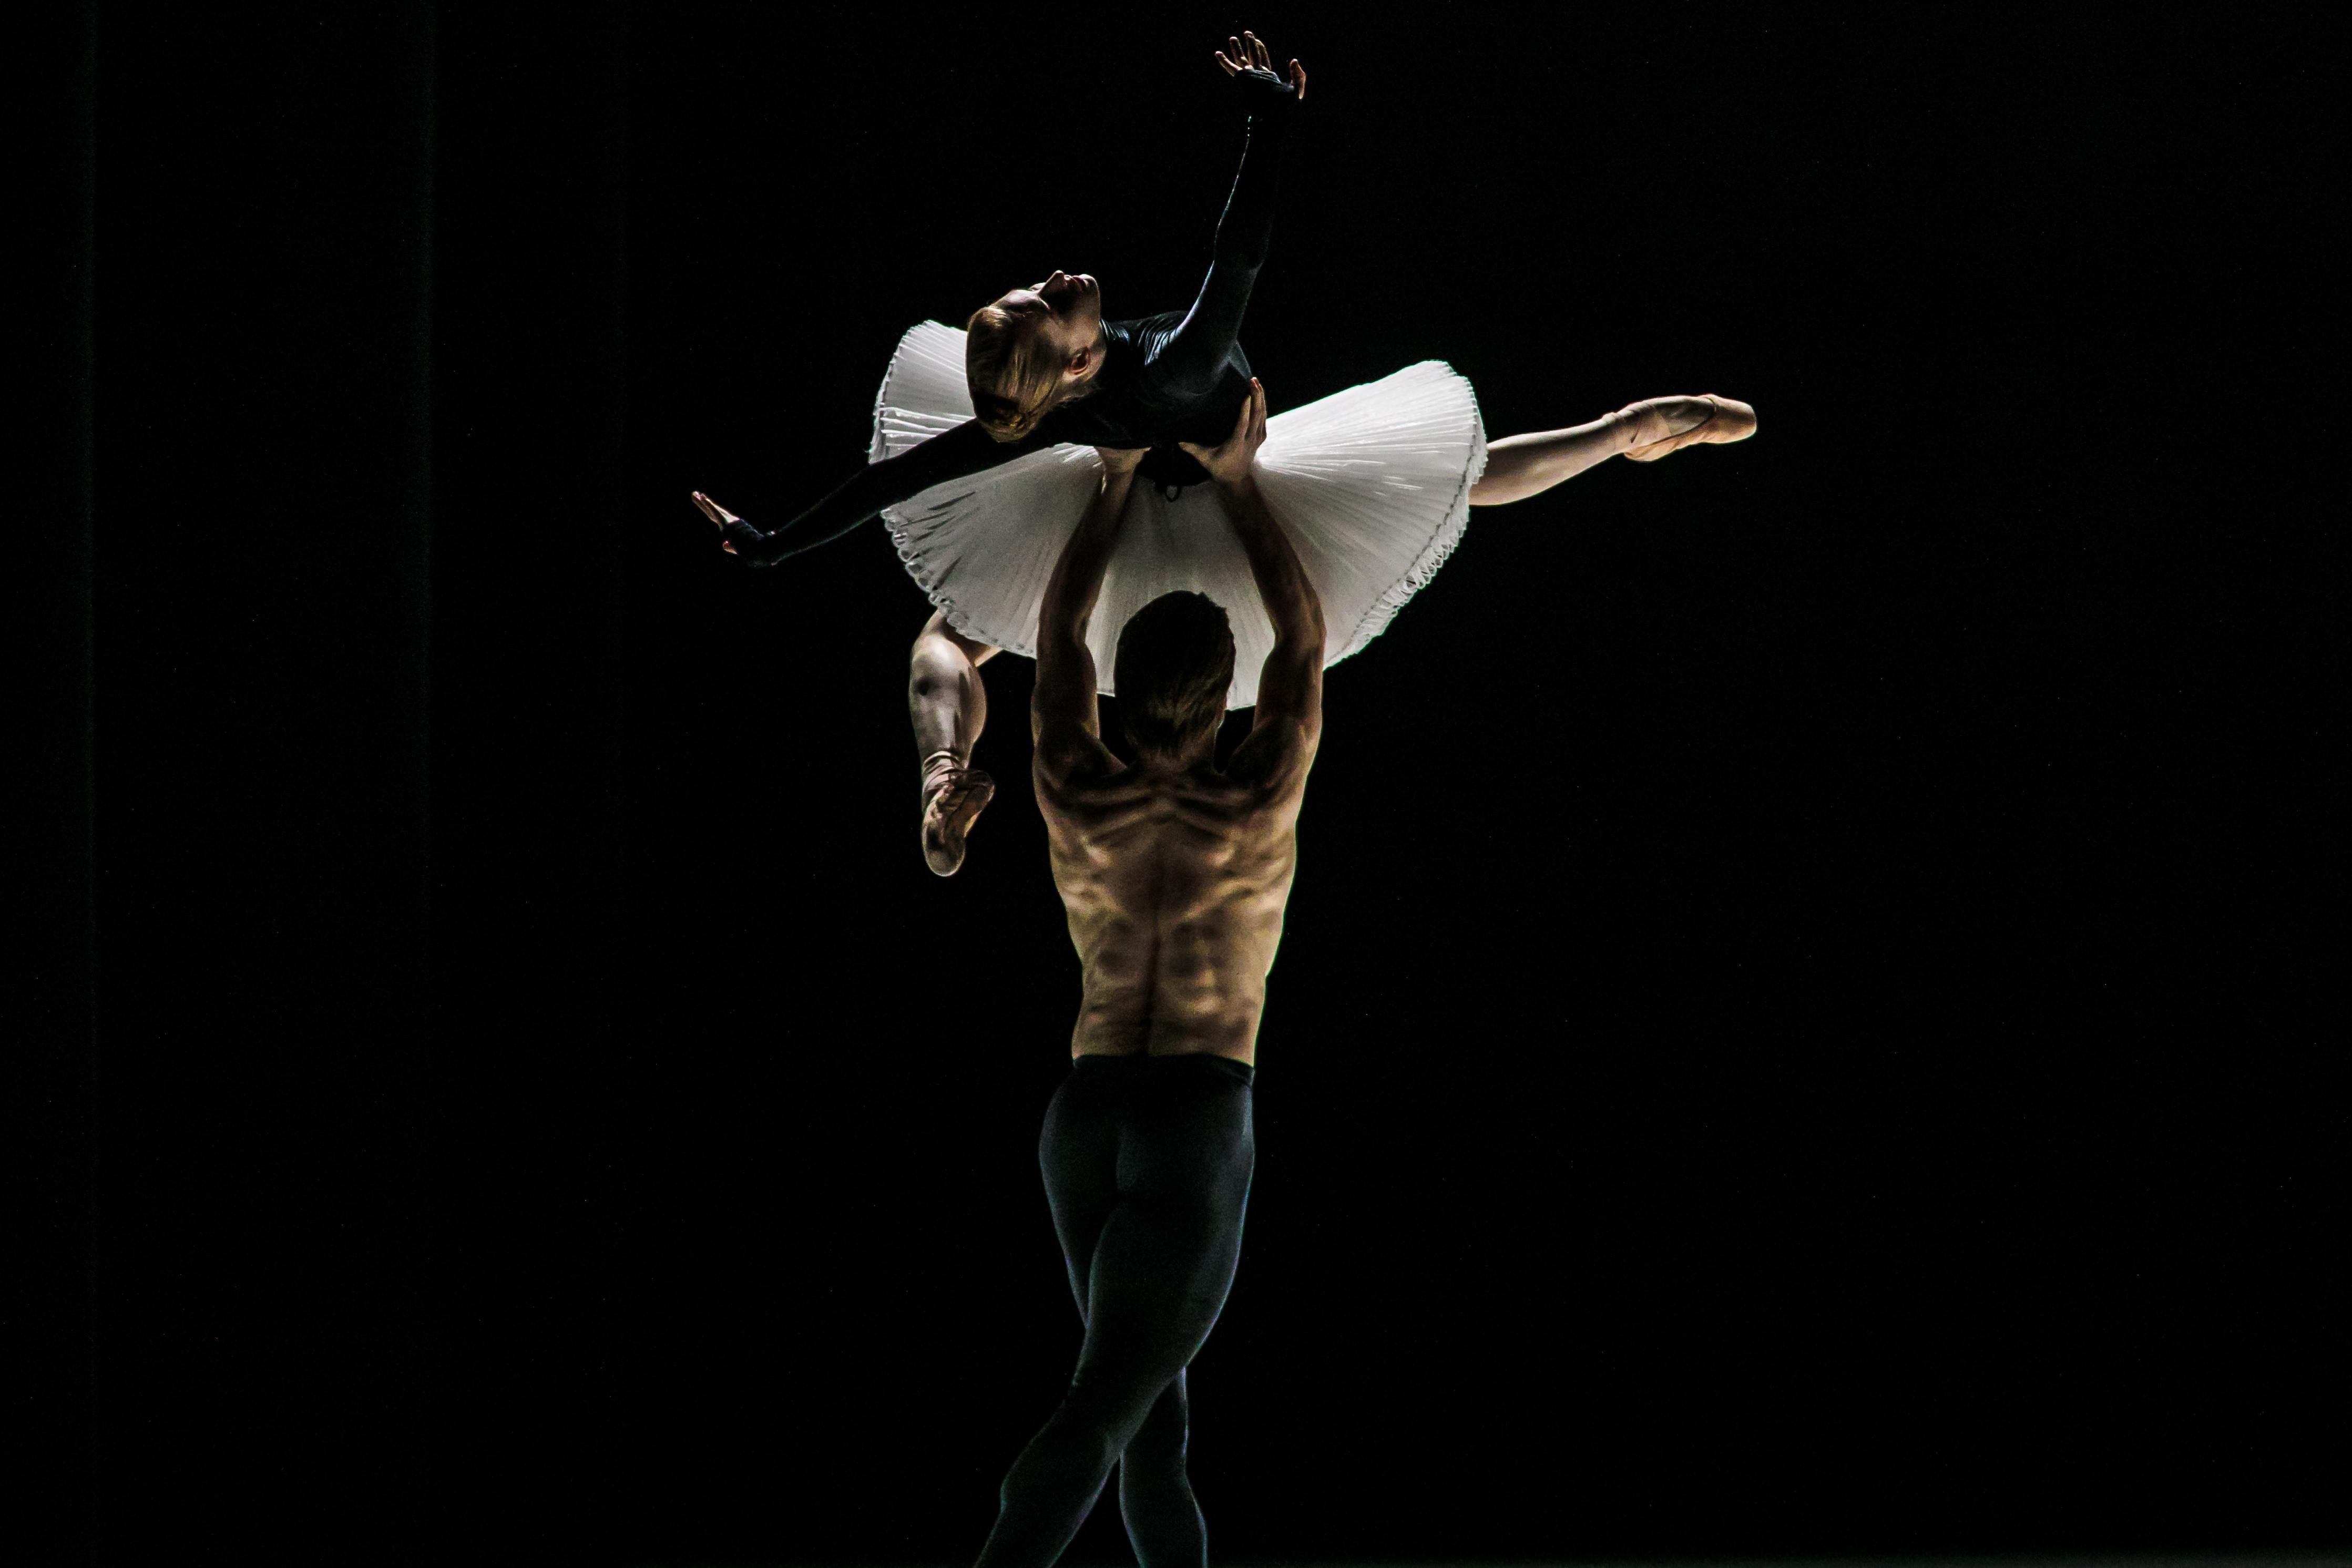 gyori_balett_movements_to_stravinsky_c_csapo_balazs_3583.JPEG